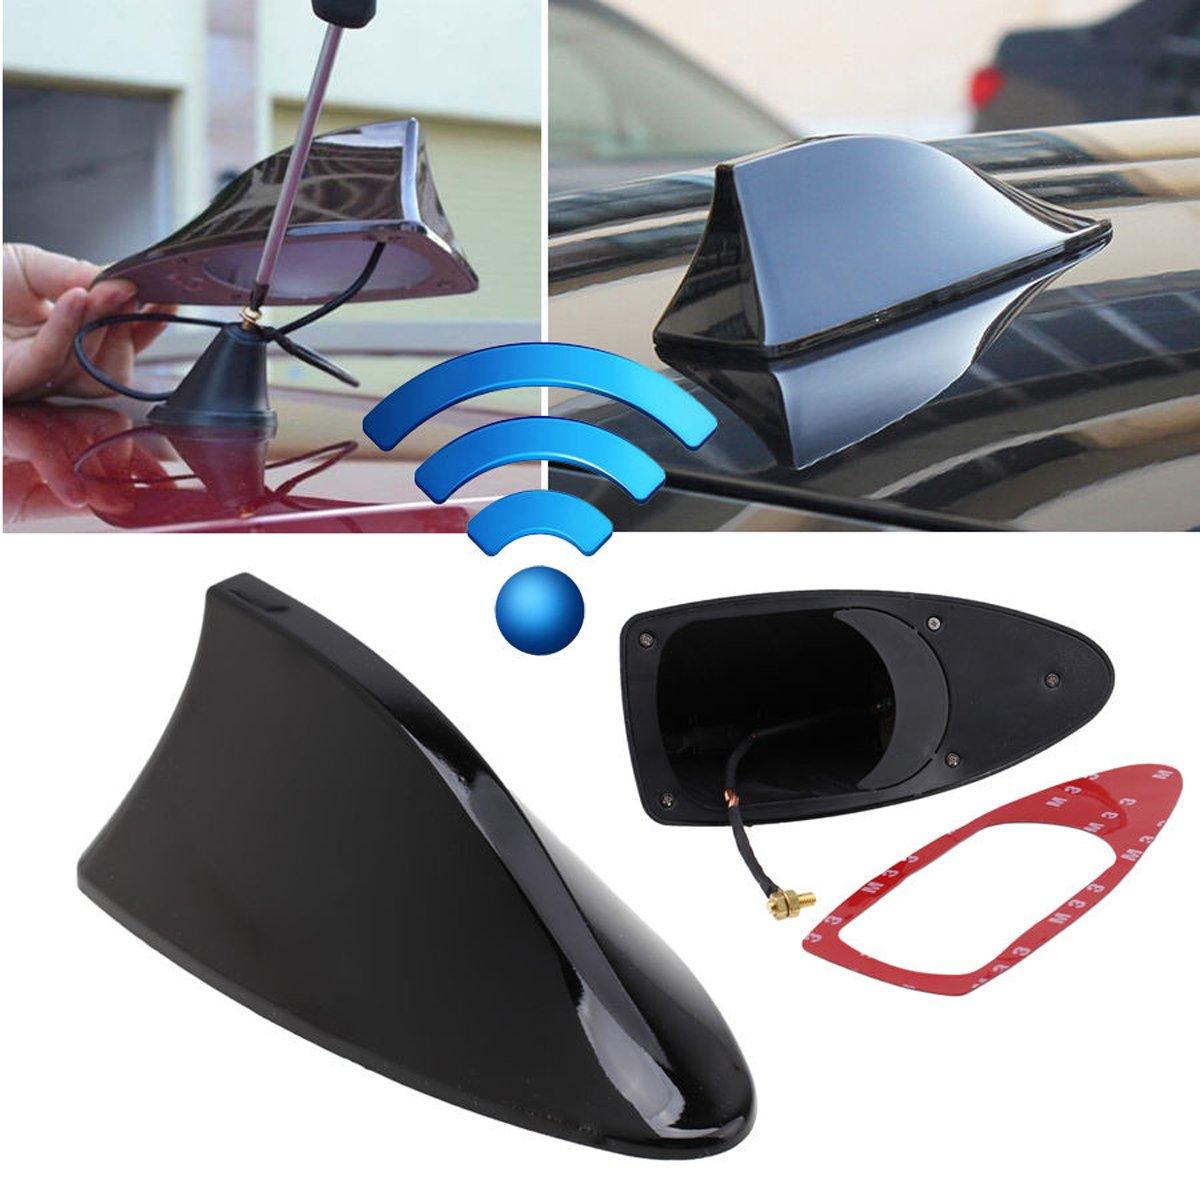 TraderPlus Universal Car Antenna Aerial Shark Fin AM/FM Radio Signal for Auto SUV Truck Van (Black)